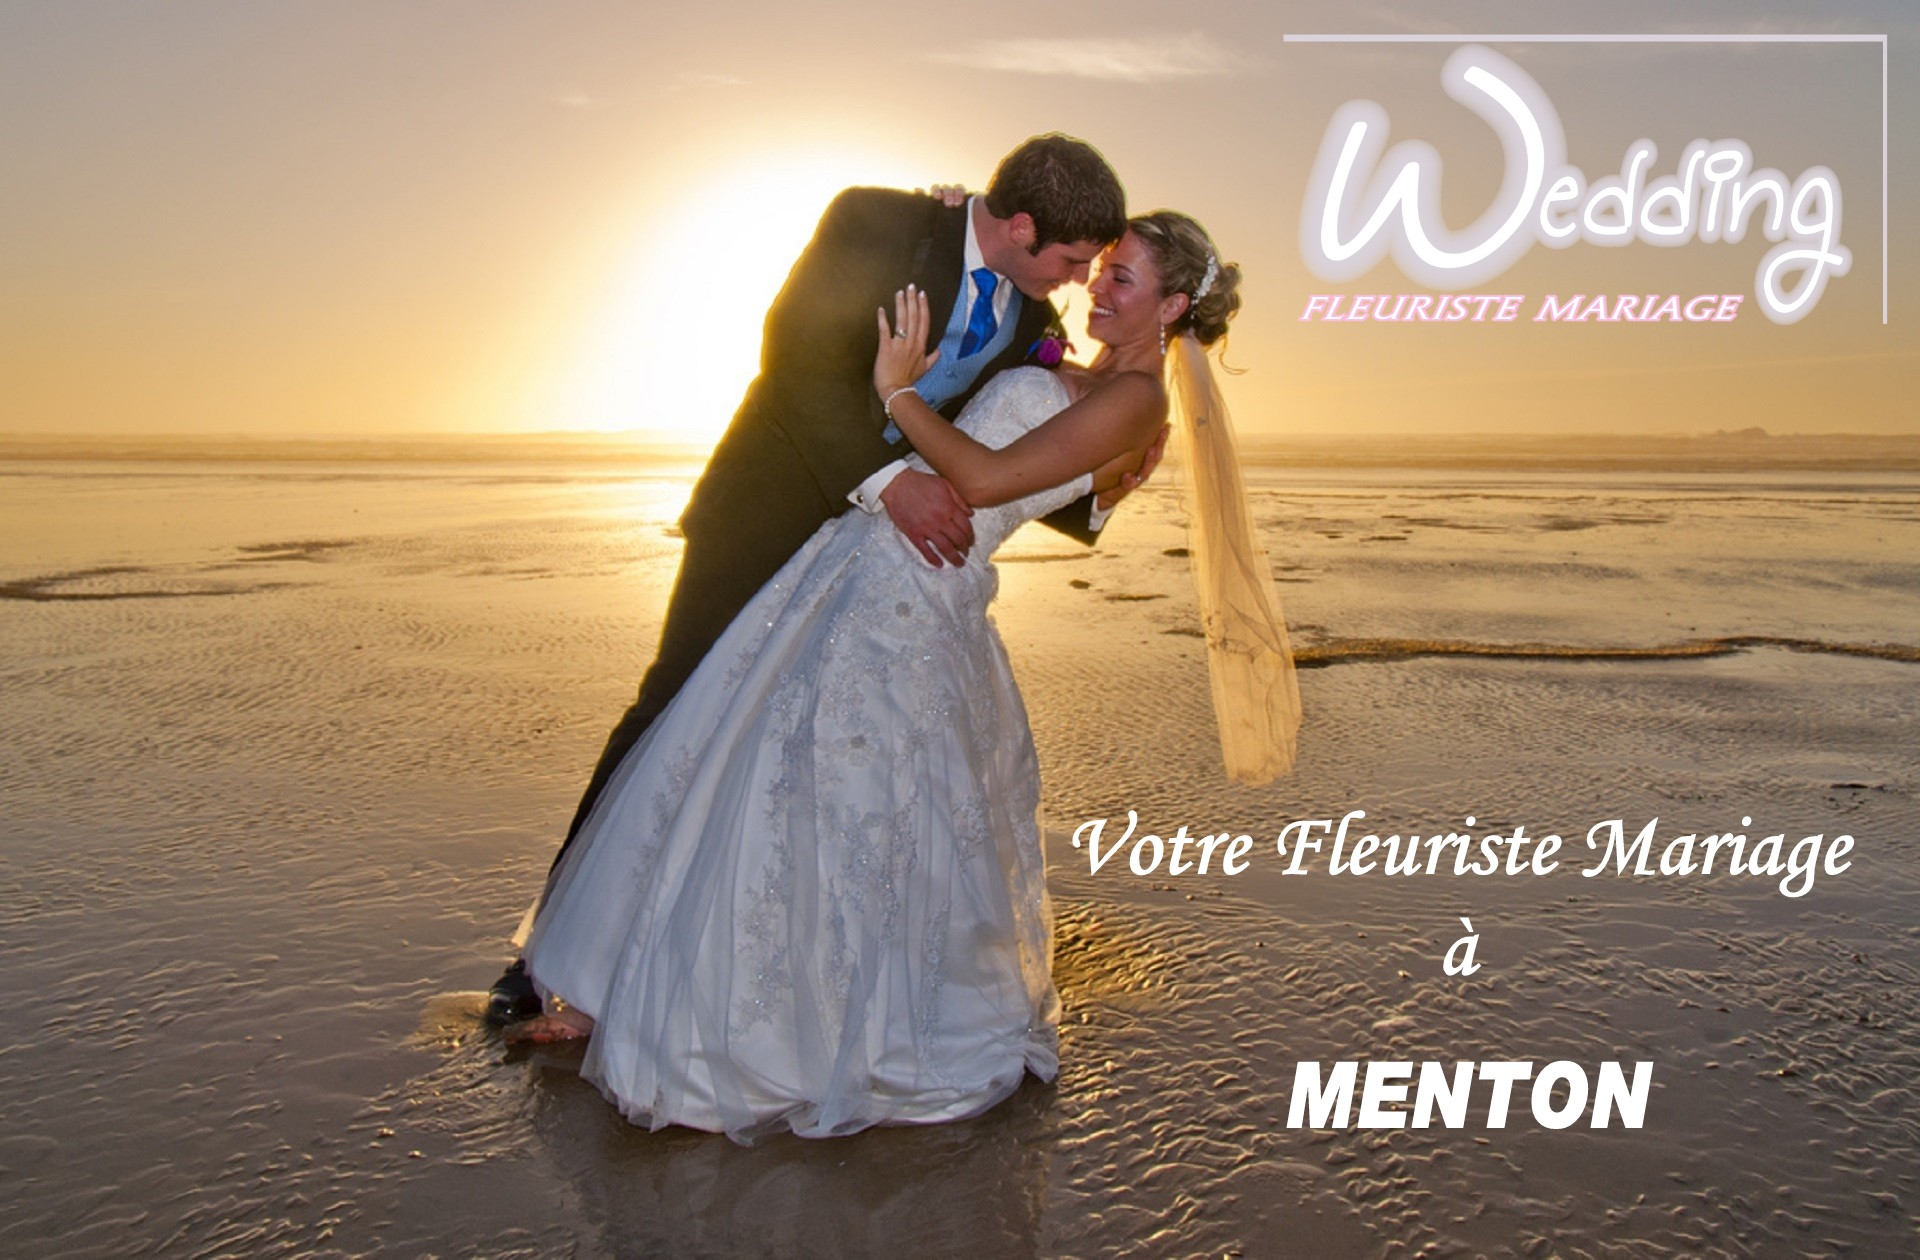 FLEURISTE MARIAGE MENTON - WEDDING PLANNER MENTON - TRAITEUR MENTON